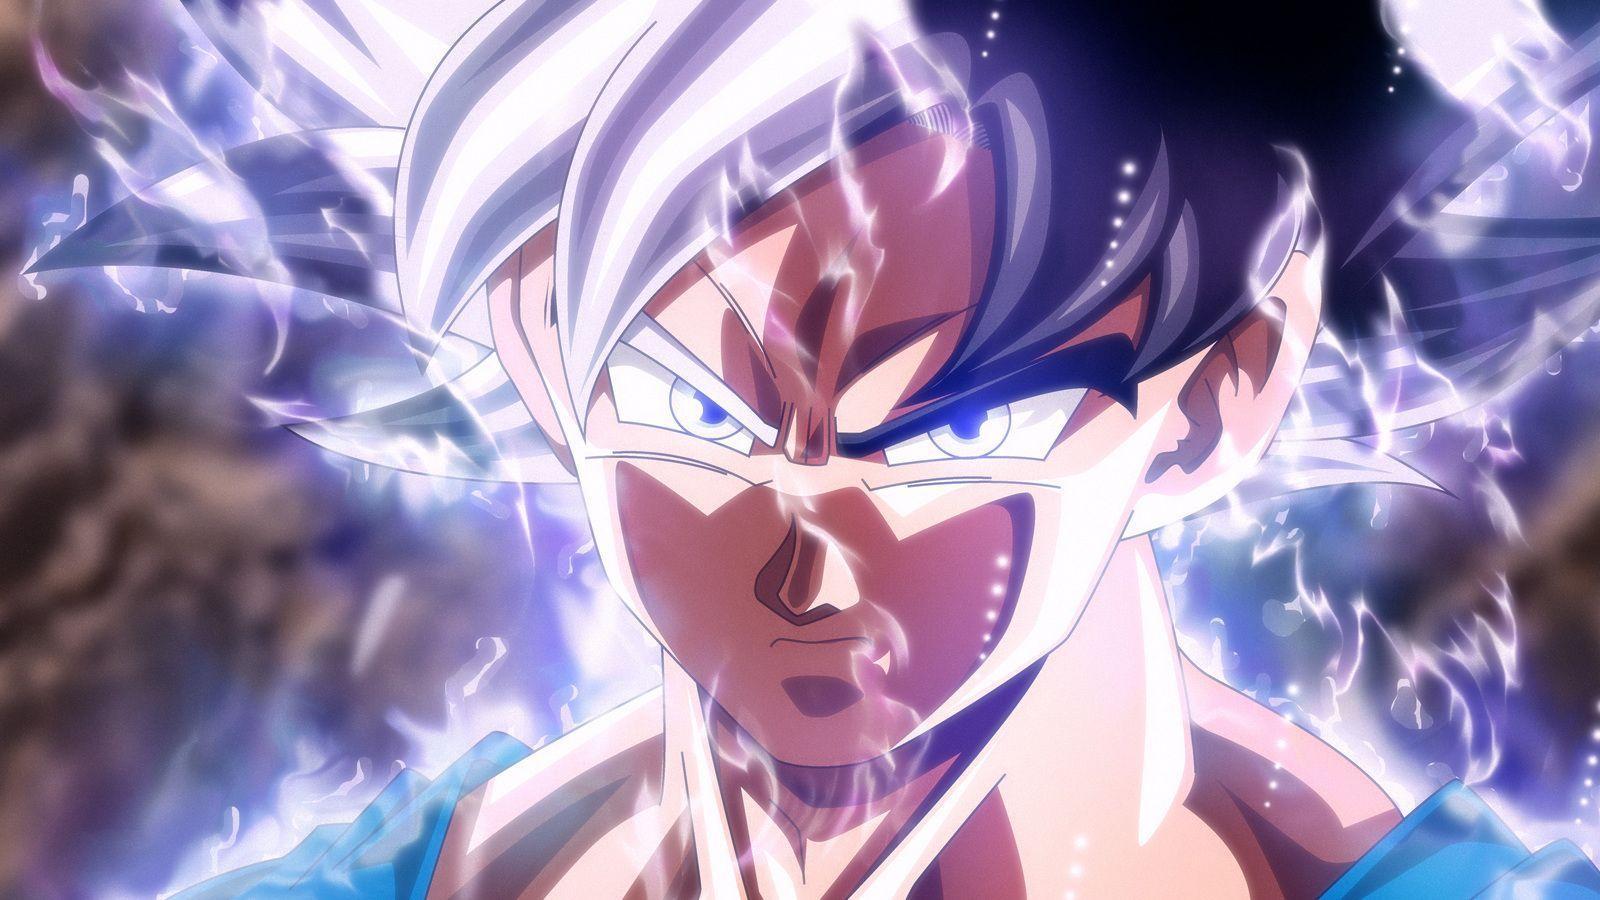 Mastered Ultra Instinct Goku Wallpapers Top Free Mastered Ultra Instinct Goku Backgrounds Wallpaperaccess